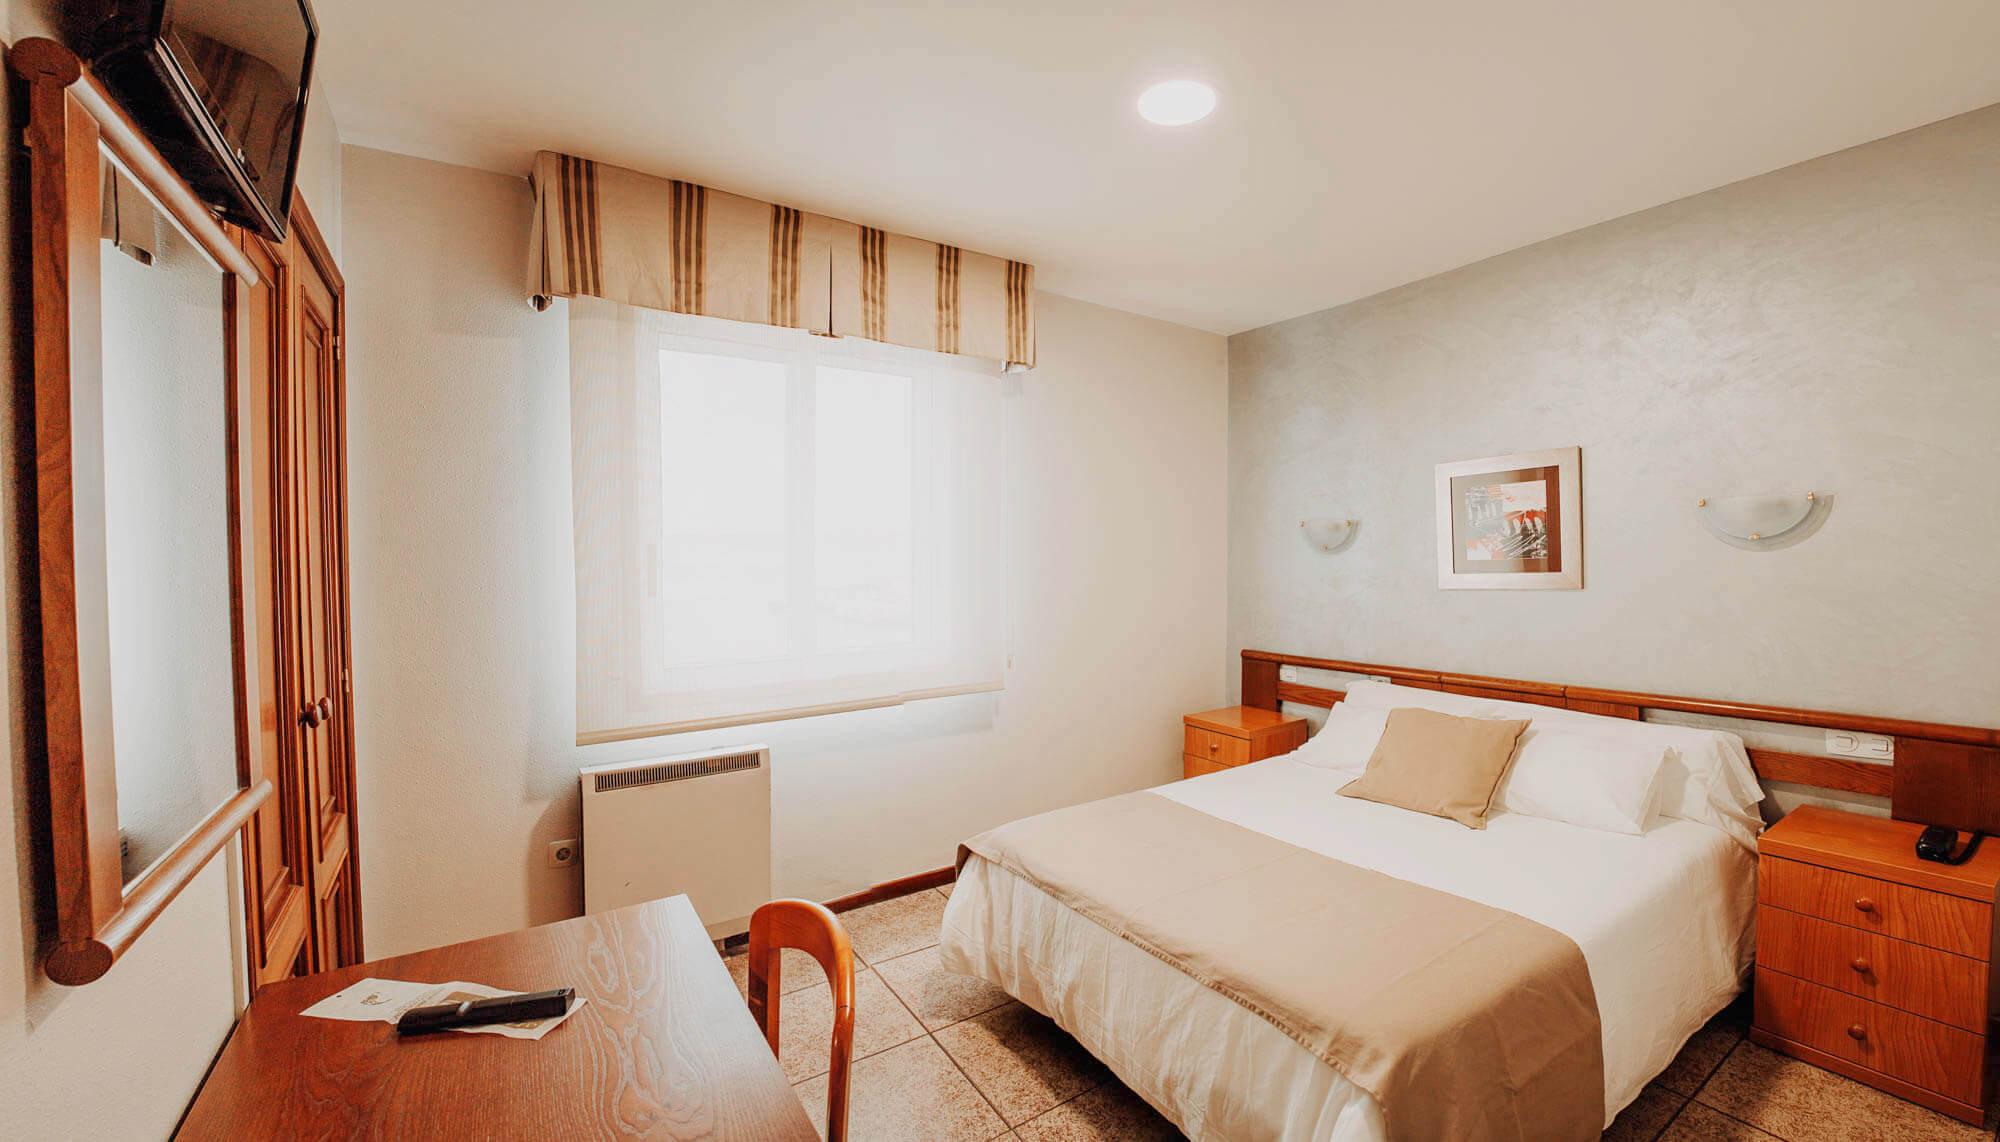 hotelincamardoble 1